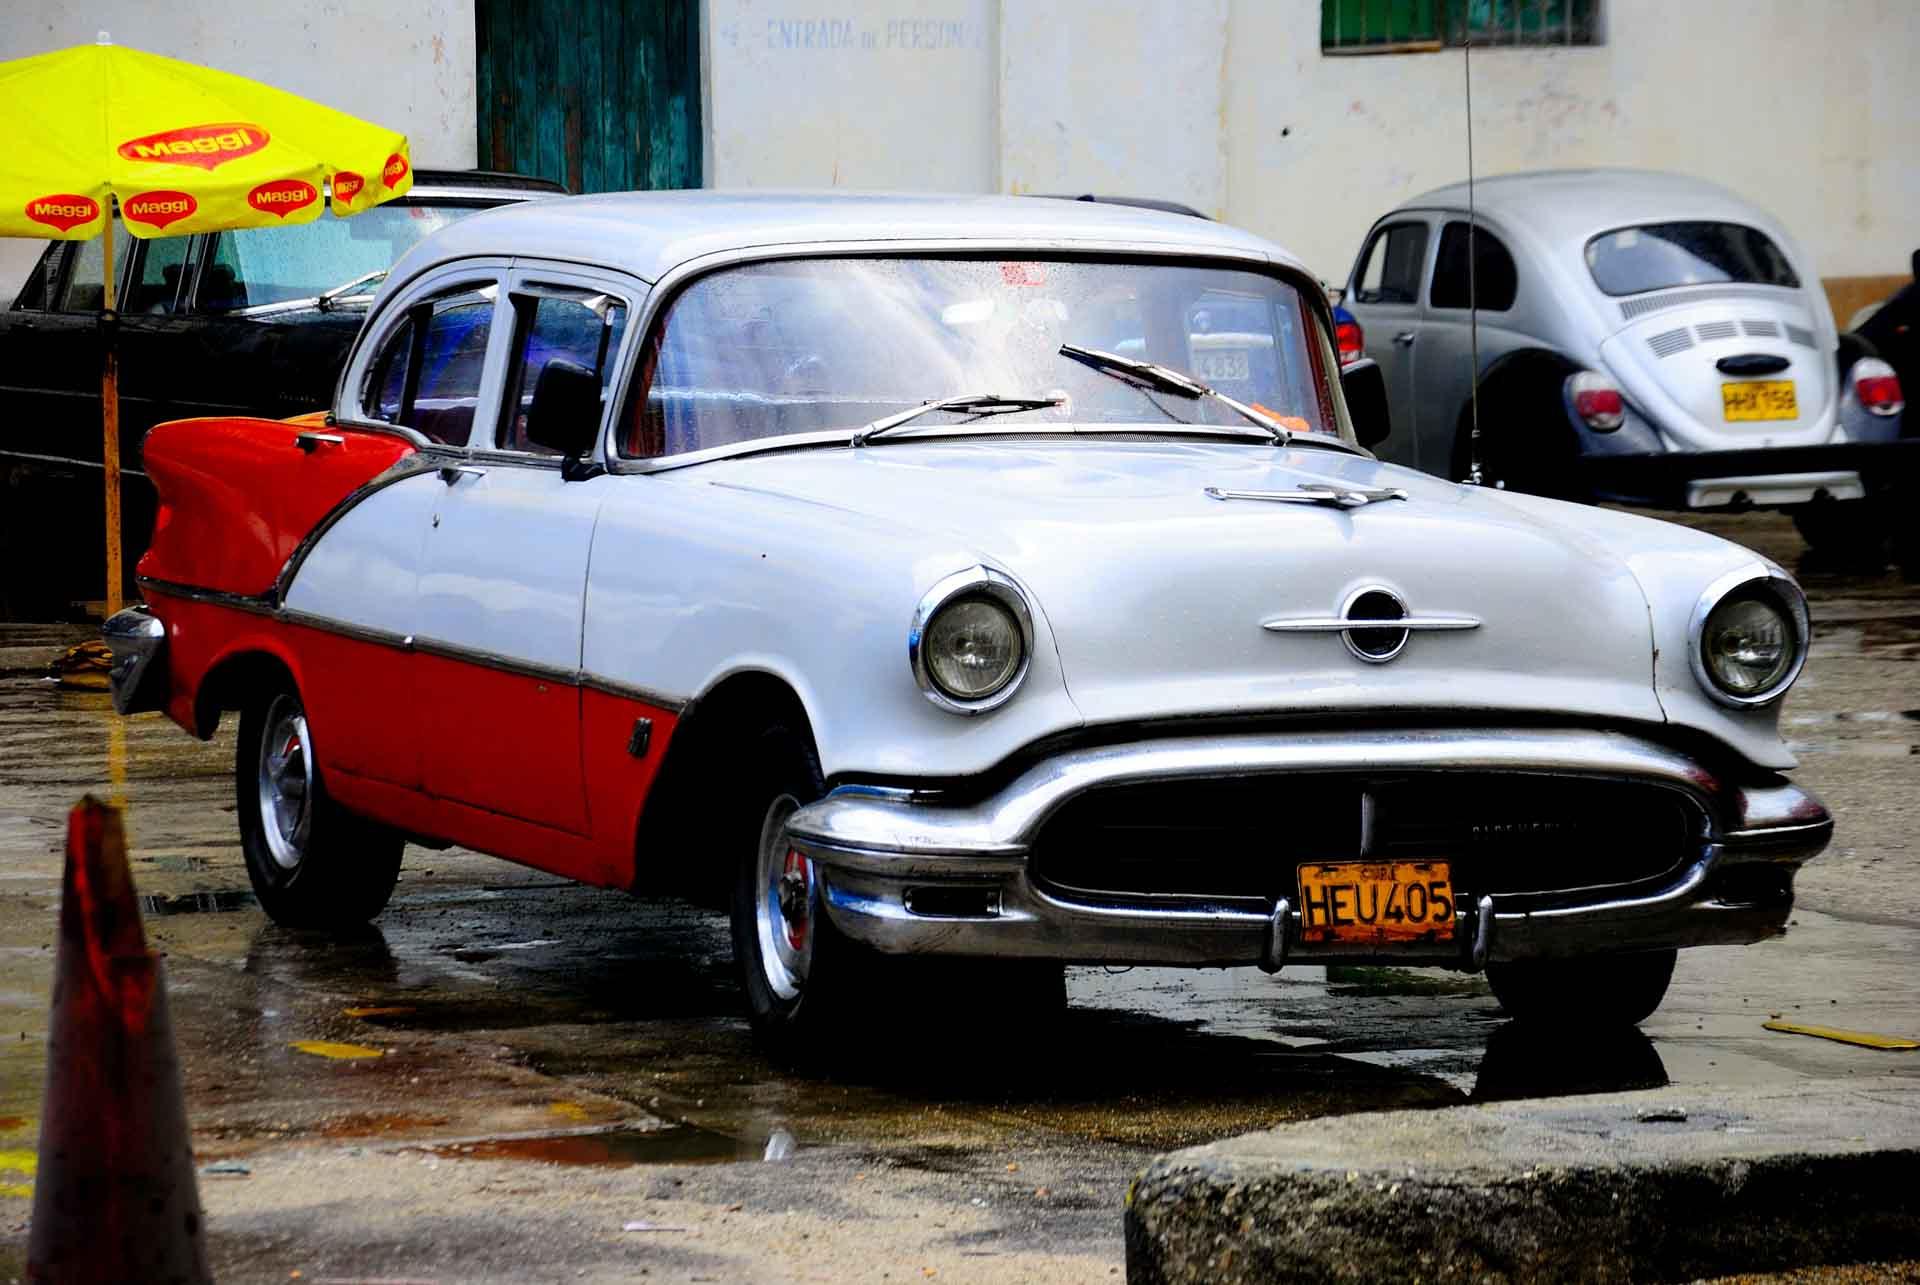 Havana Cuba Vintage Car 5 - PescArt - Enrico Pescantini